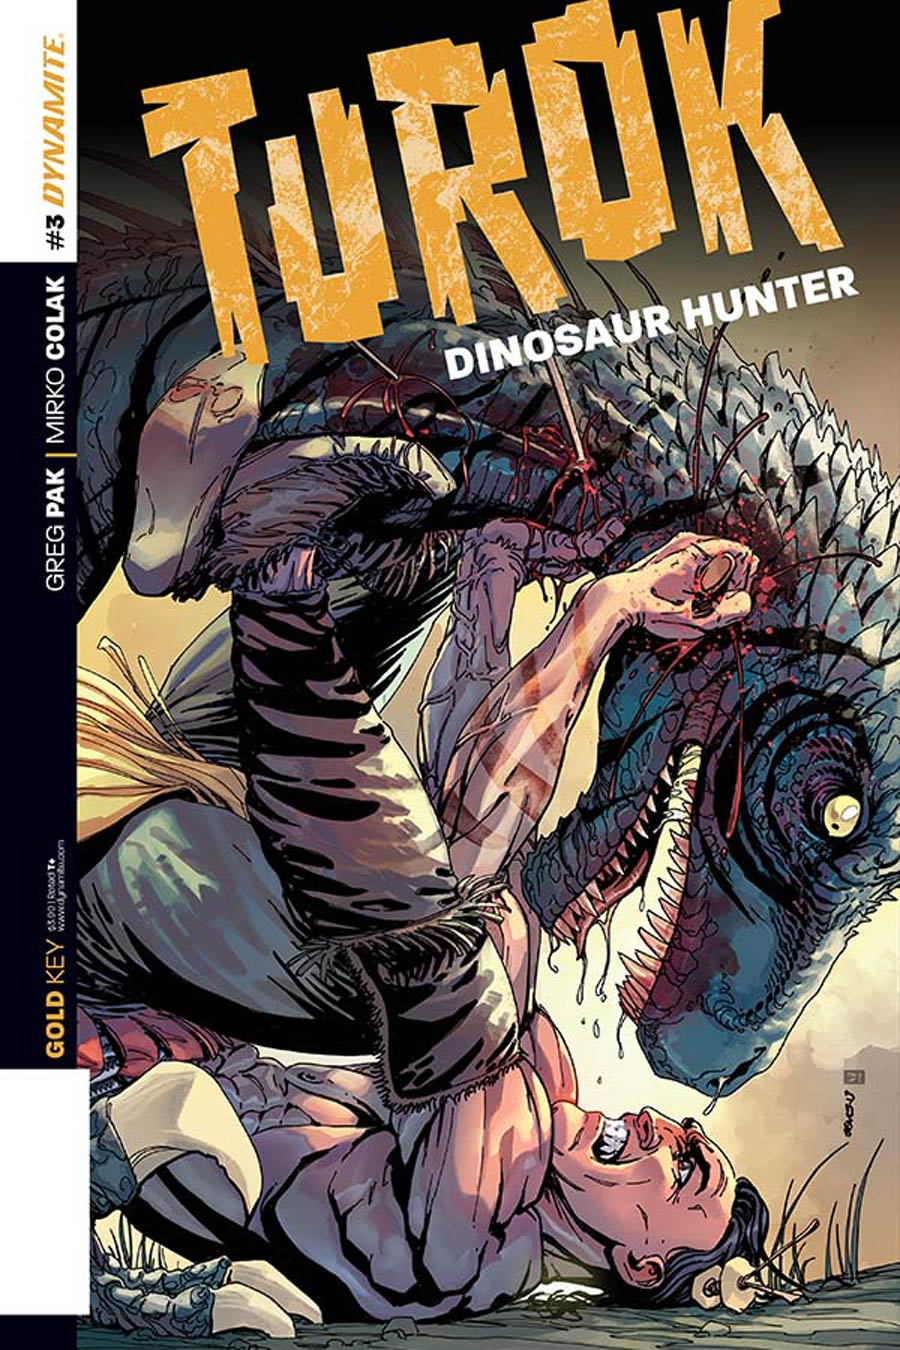 Turok Dinosaur Hunter Vol 2 #3 Cover A Regular Bart Sears Cover